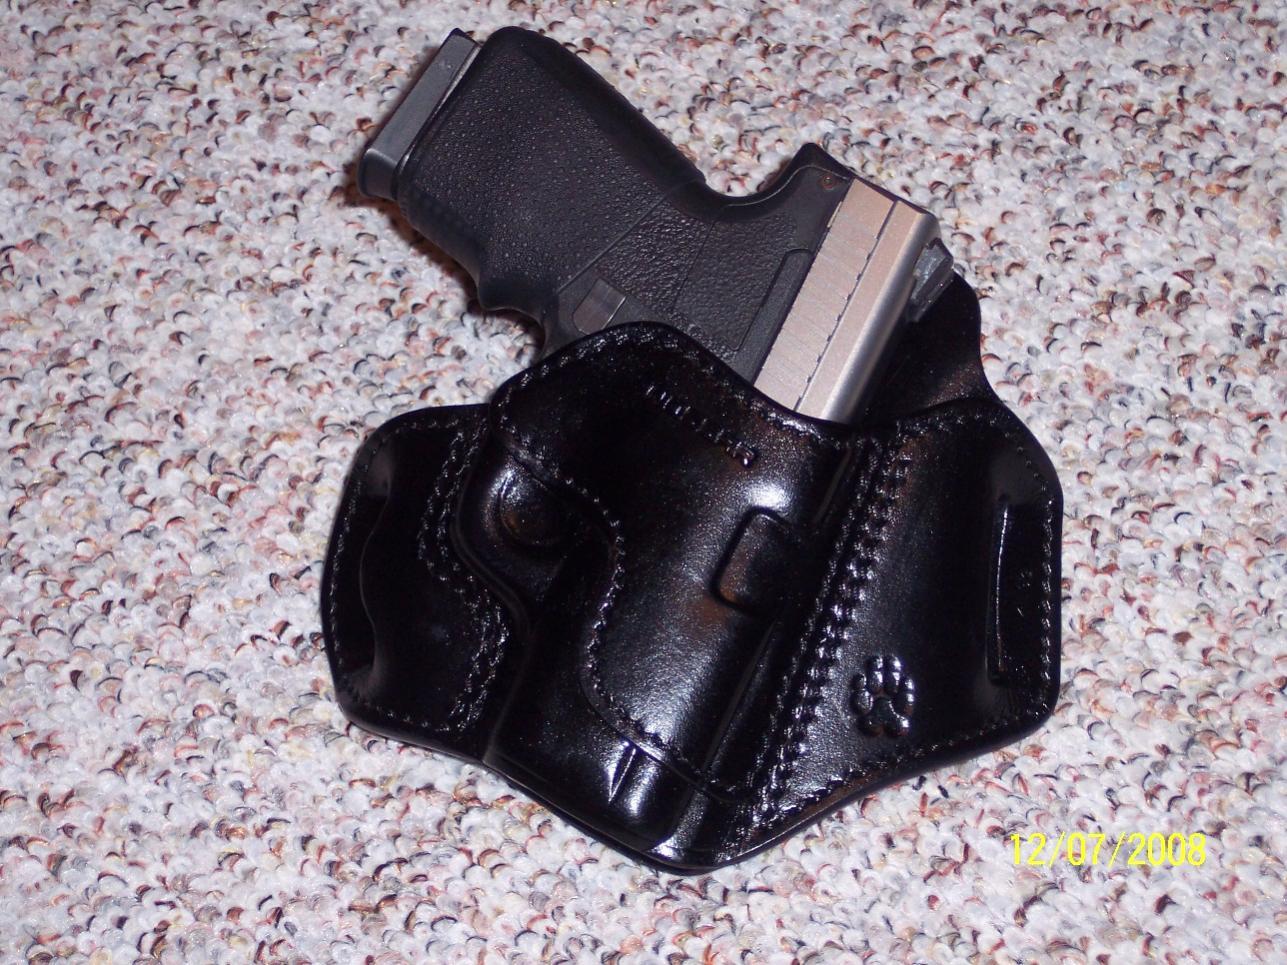 New NOSSAR leather for my PM45-new-nossar-holster.jpg